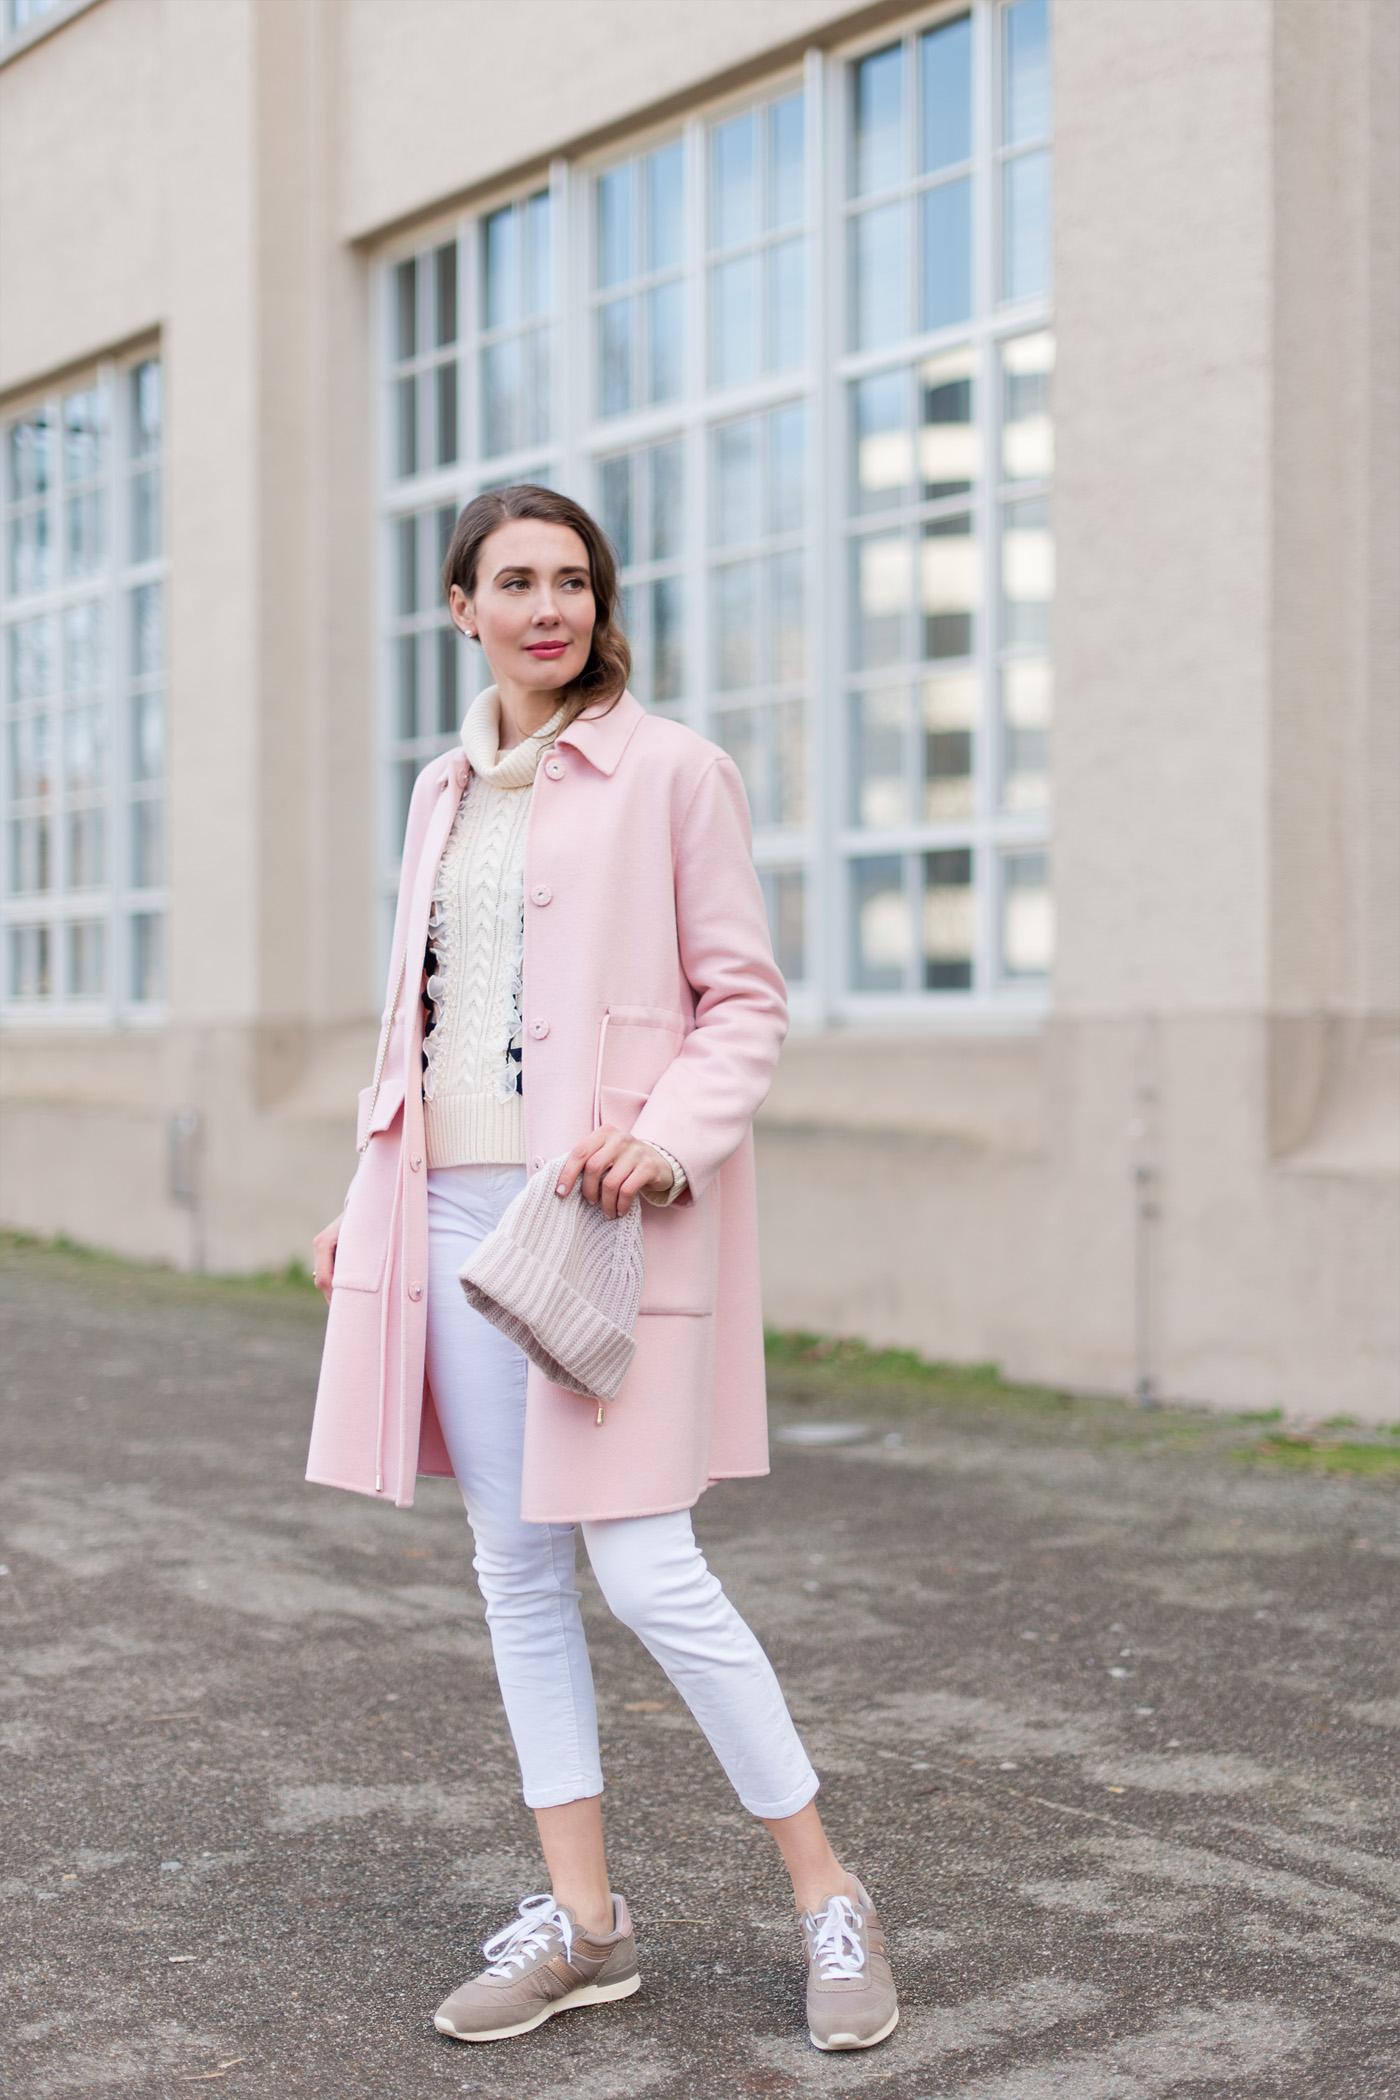 maxandco-pink-coat-hugoboss-sneaker-jcrew-sweater-springfashion